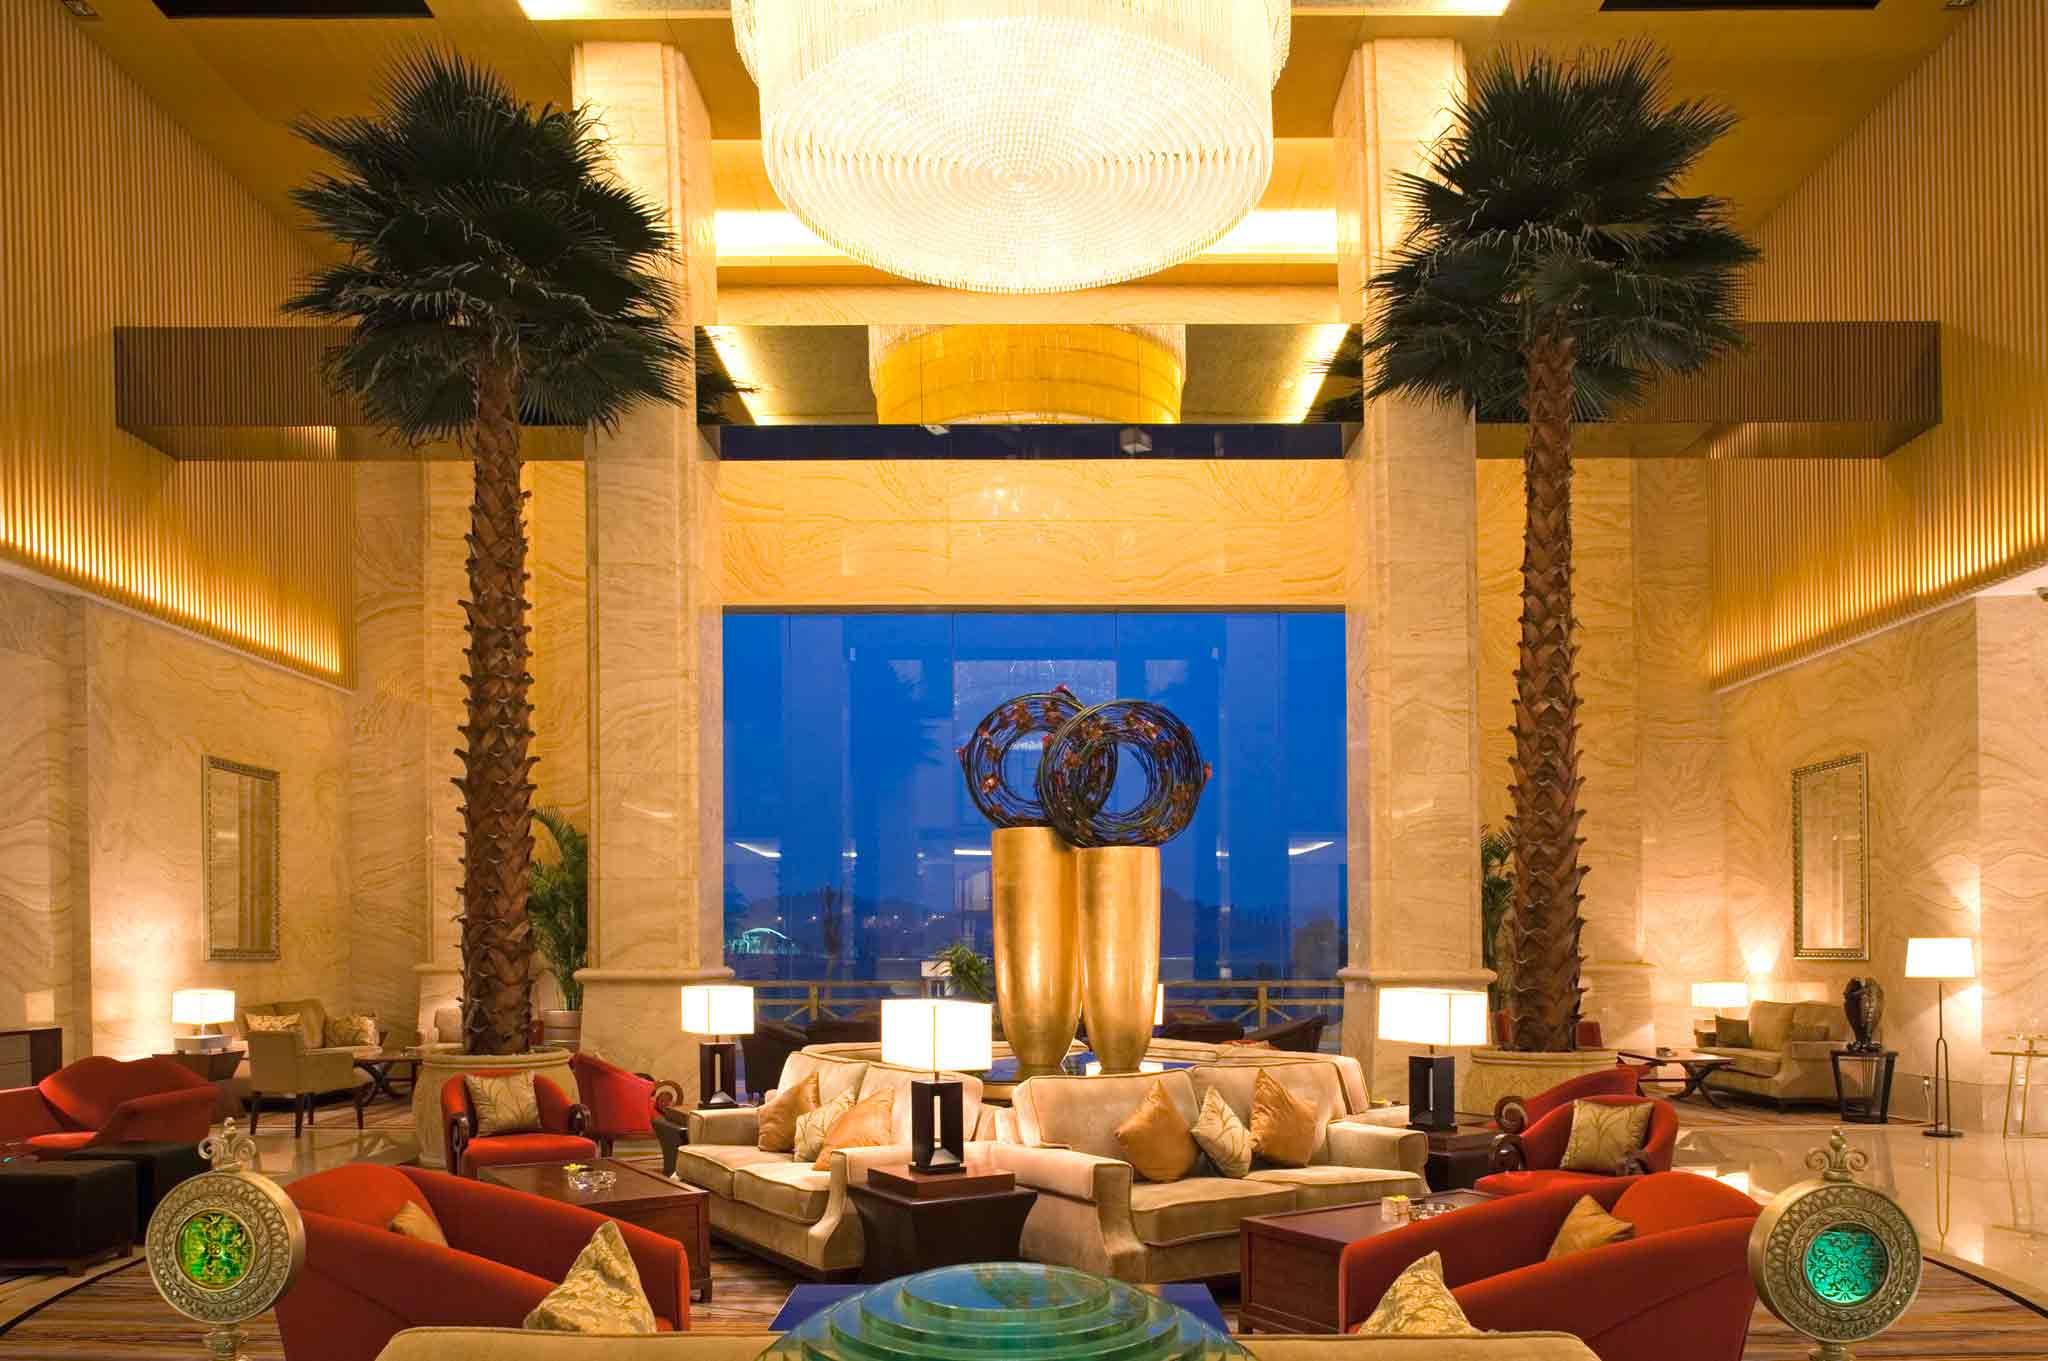 Hotel – Sofitel Nanjing Zhongshan Golf Suning